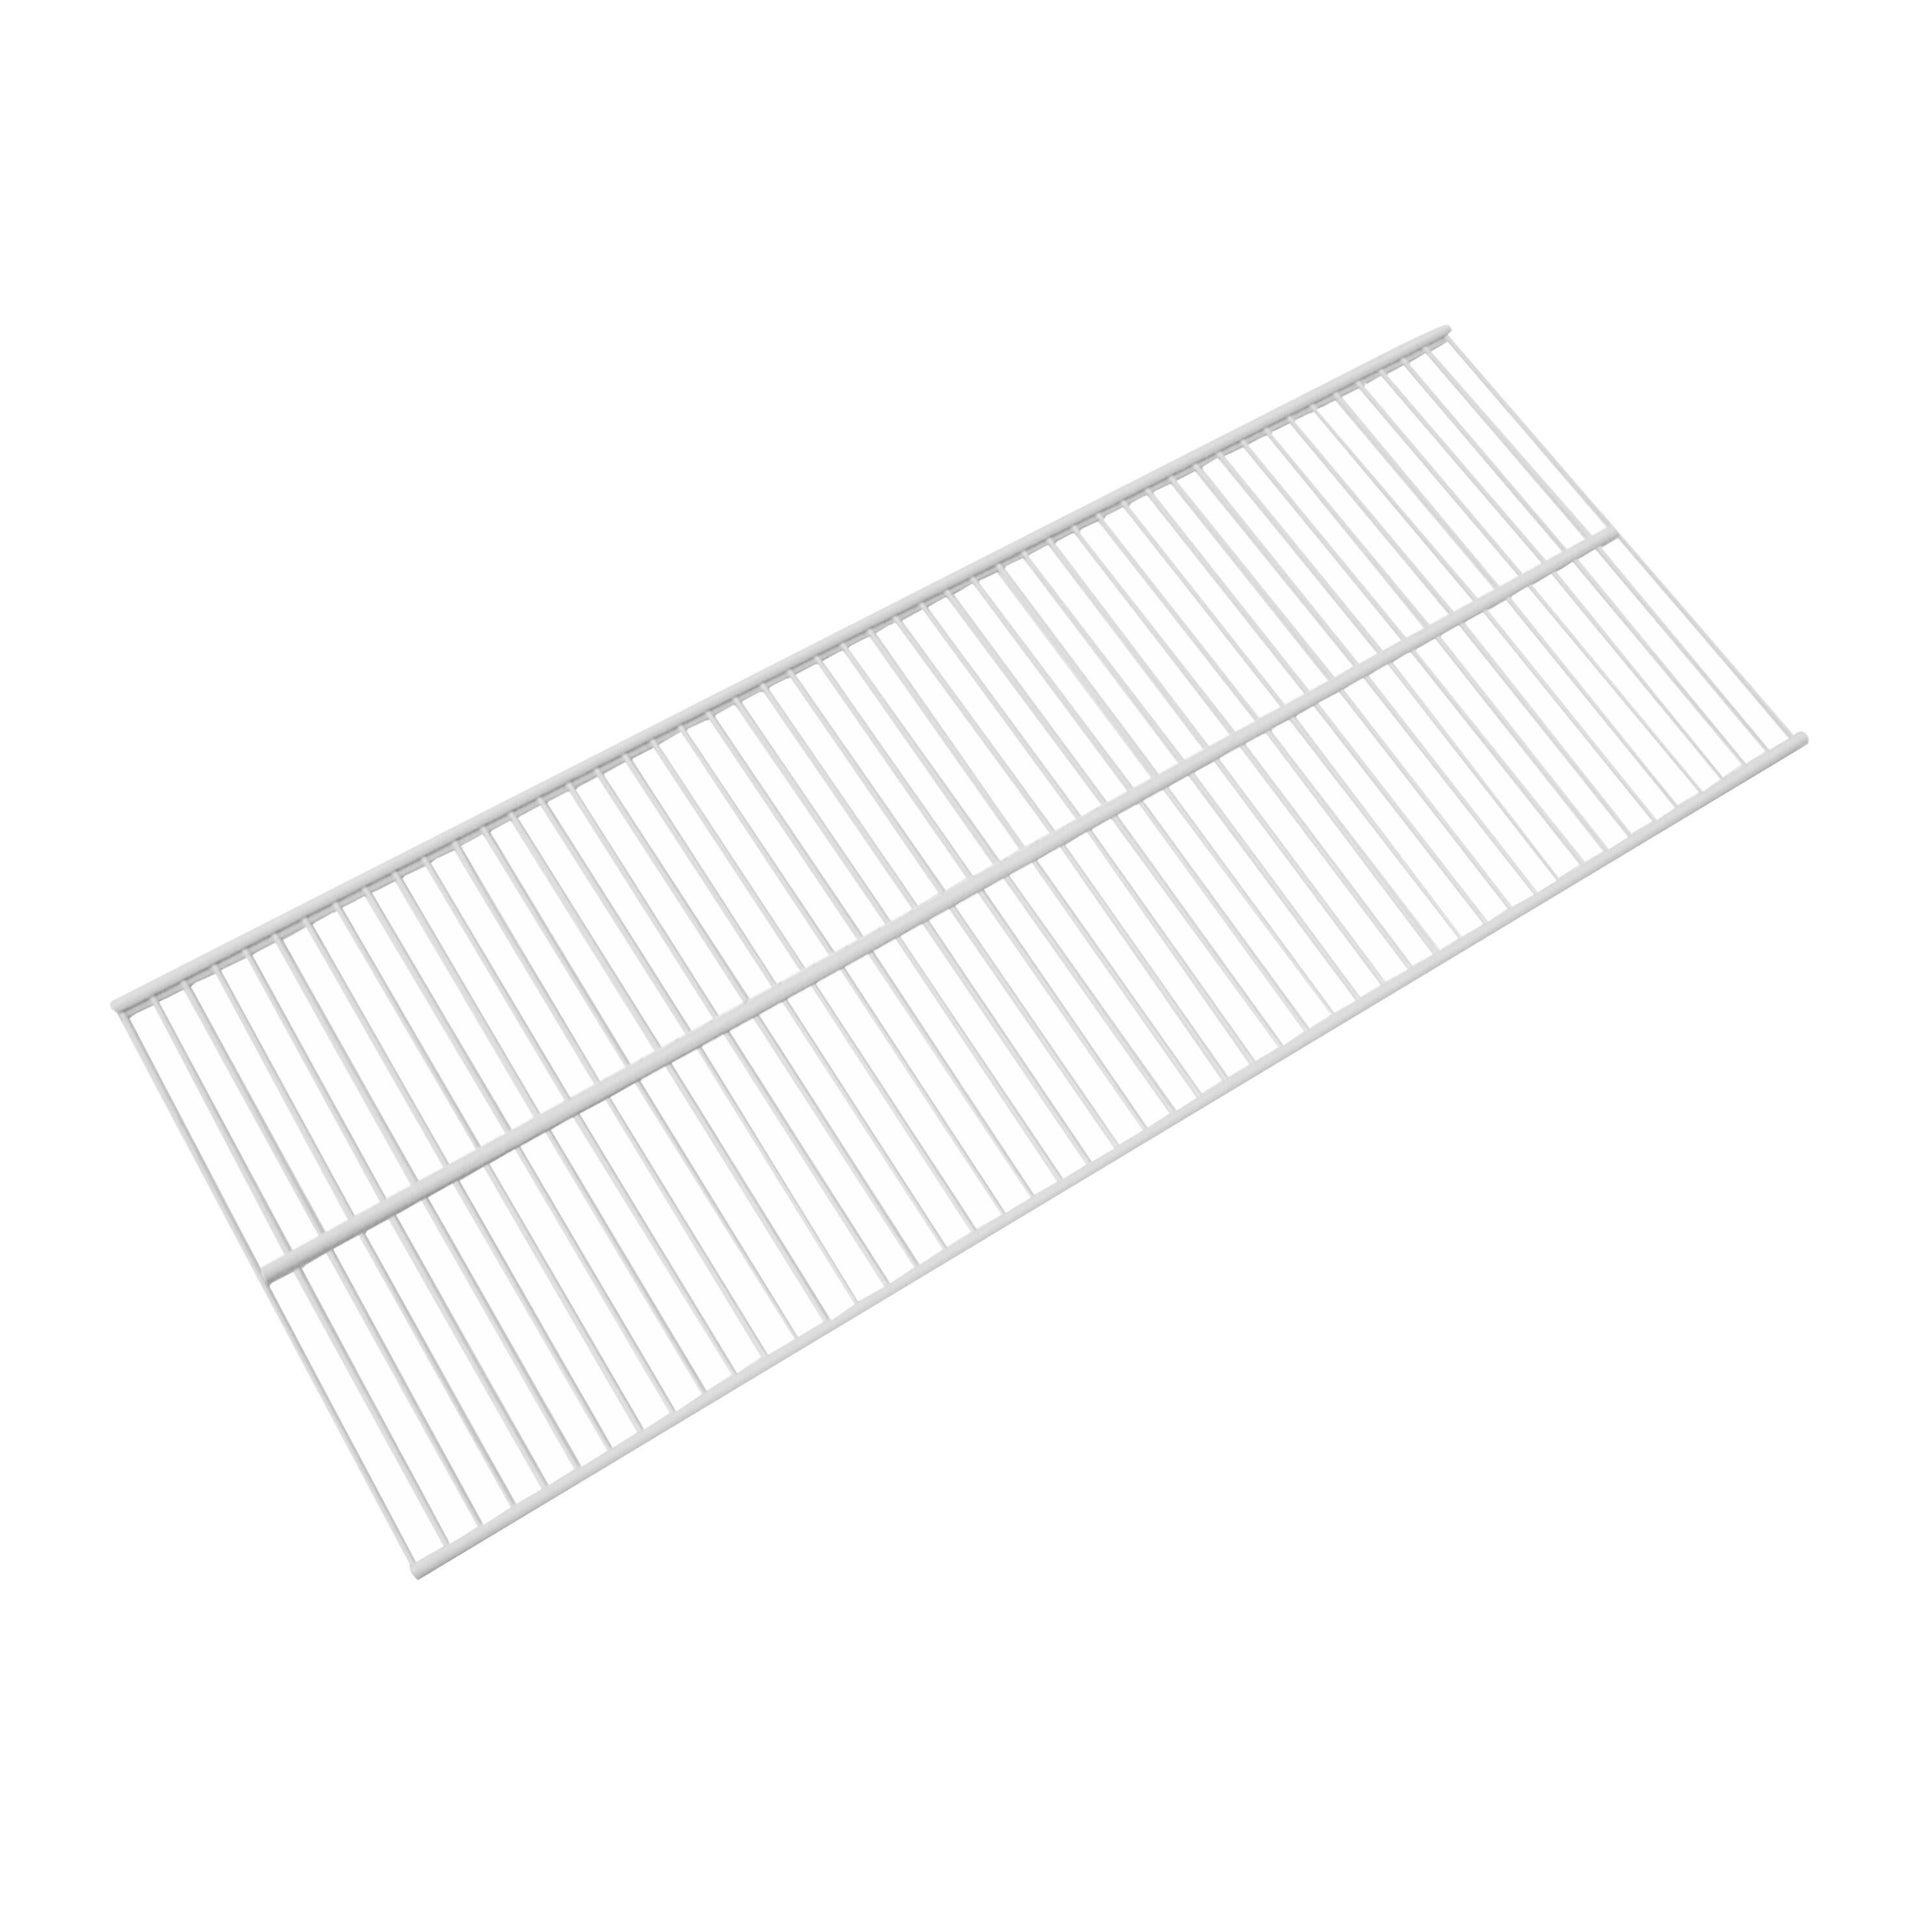 Reggimensola Spaceo L 80.0 x H 30.0 x P 30.0 cm bianco - 11